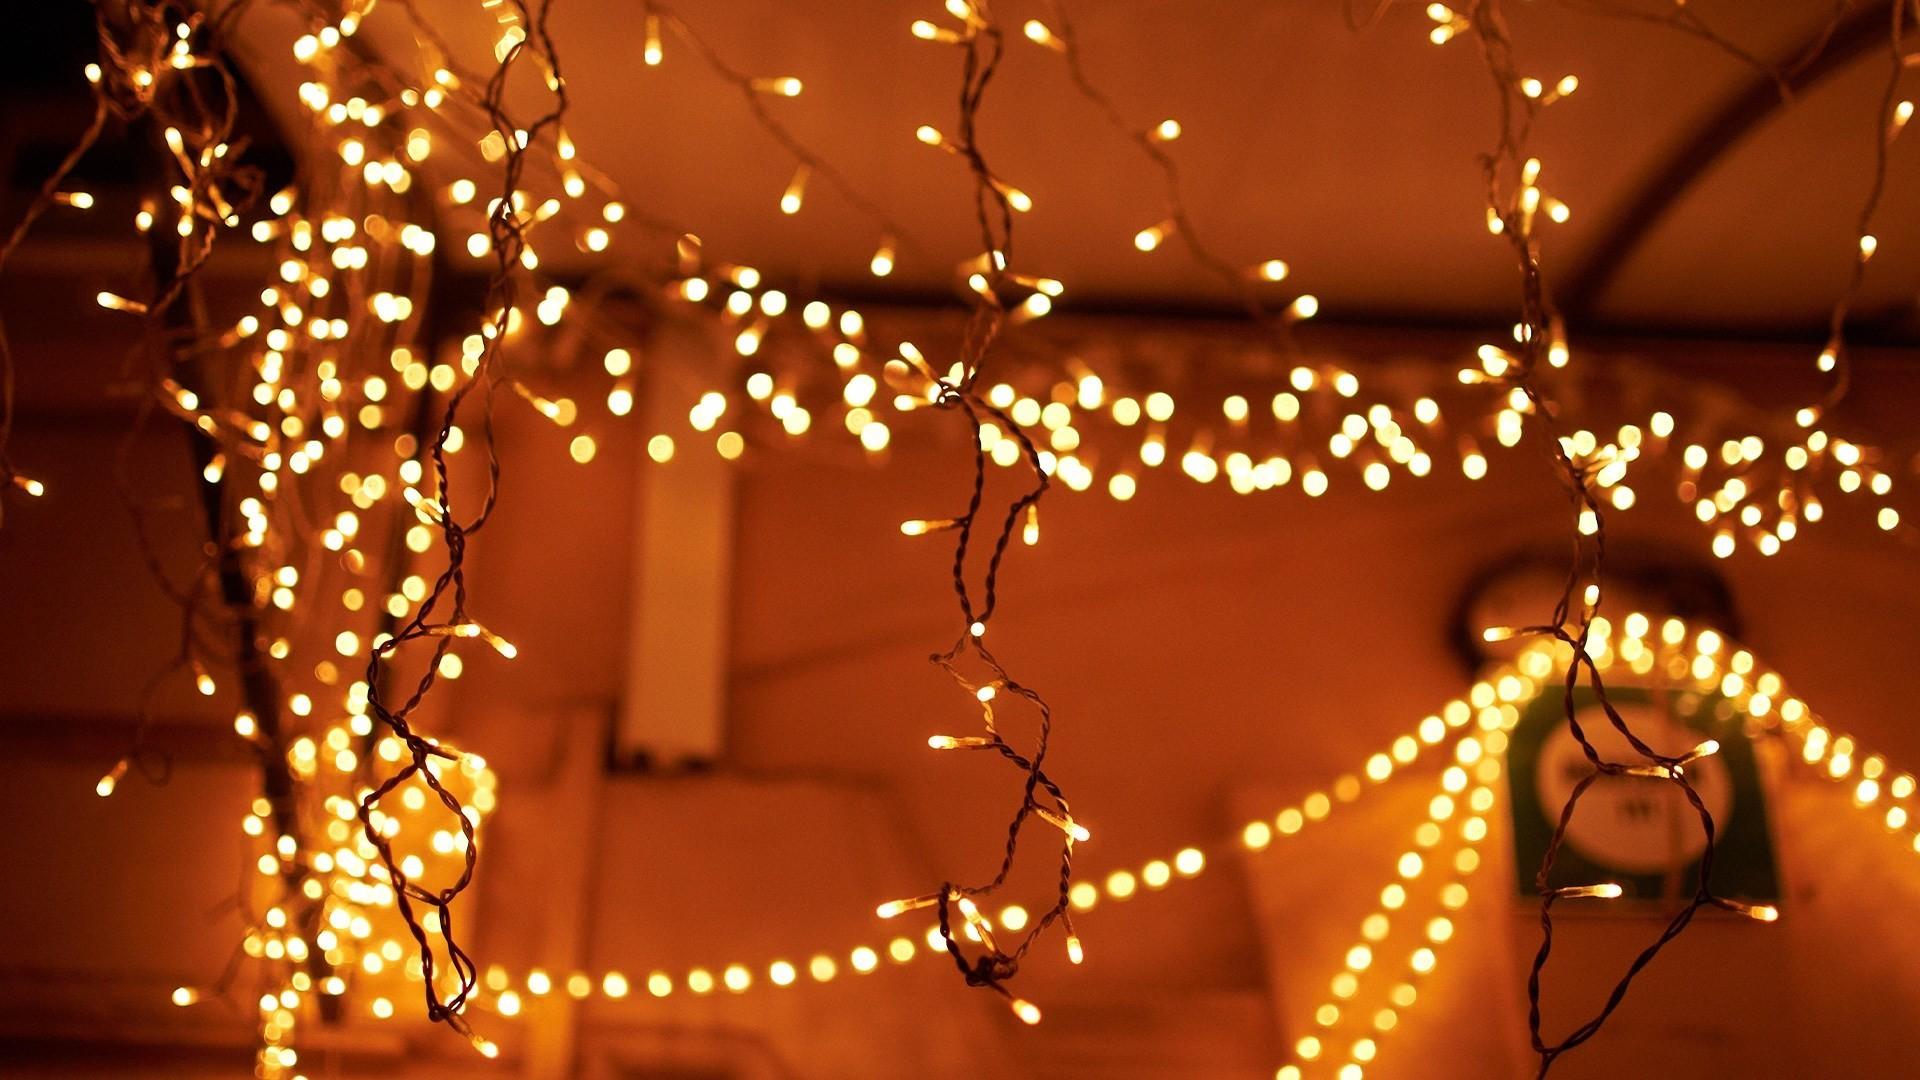 Christmas lights hd wallpaper.